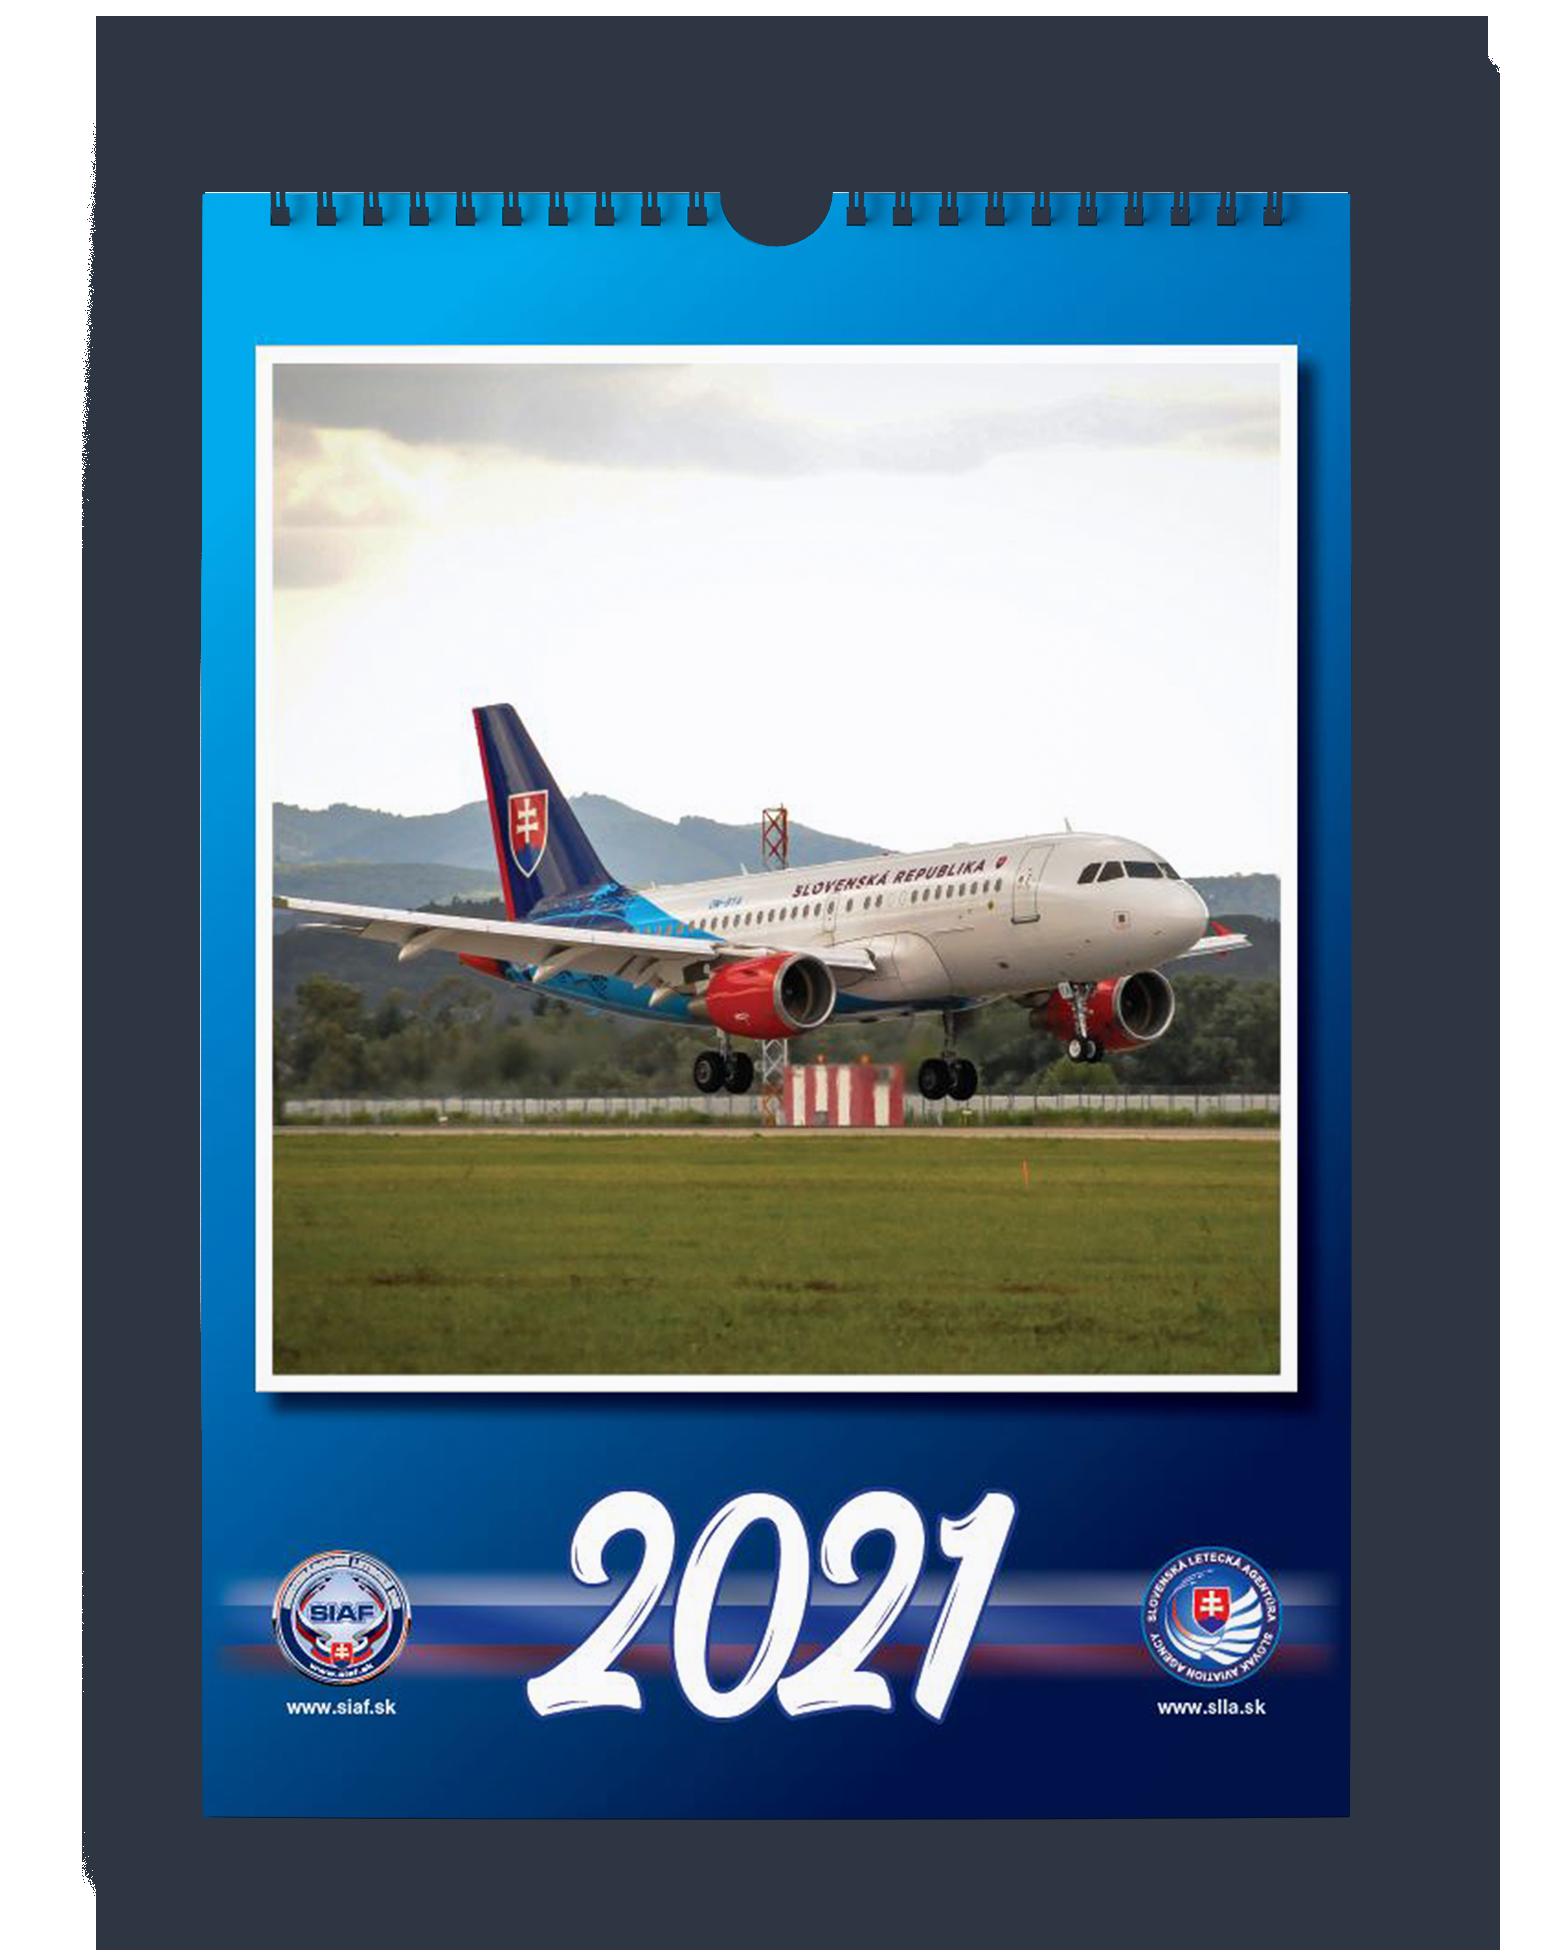 Kalendár AIR SHOW 2021 - Kalendár AIR SHOW 2021 s vašimi fotkami